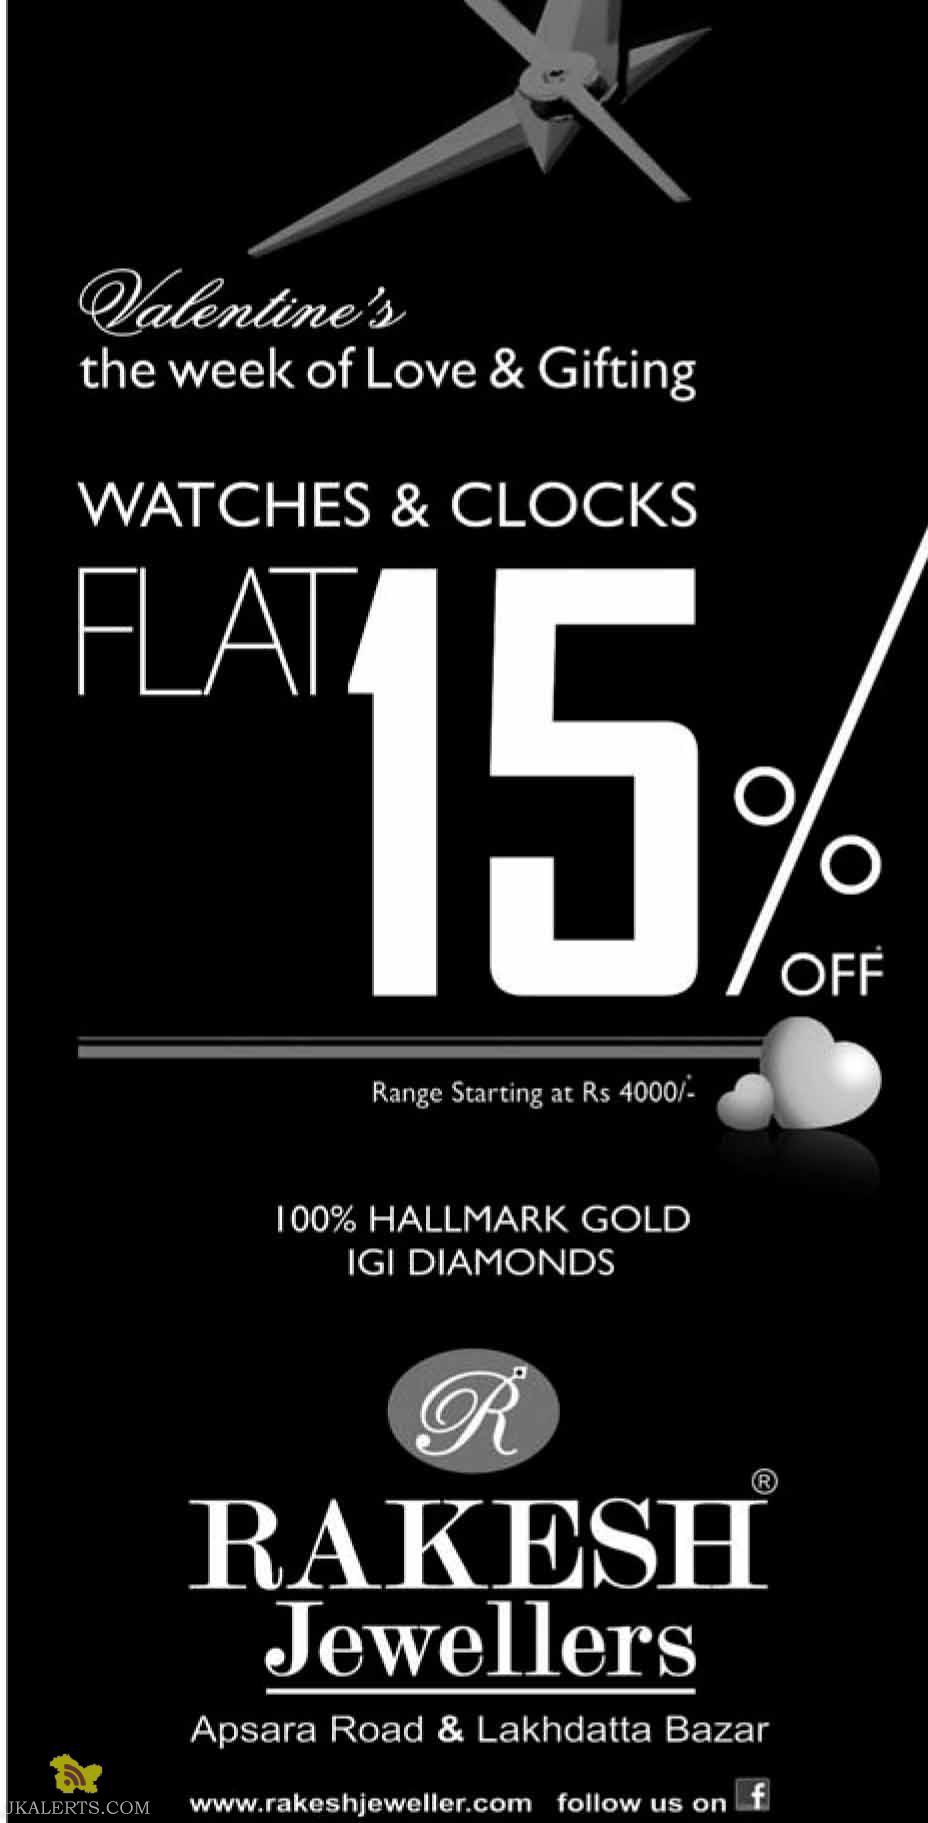 Rakesh Jewellers Flat 15% off